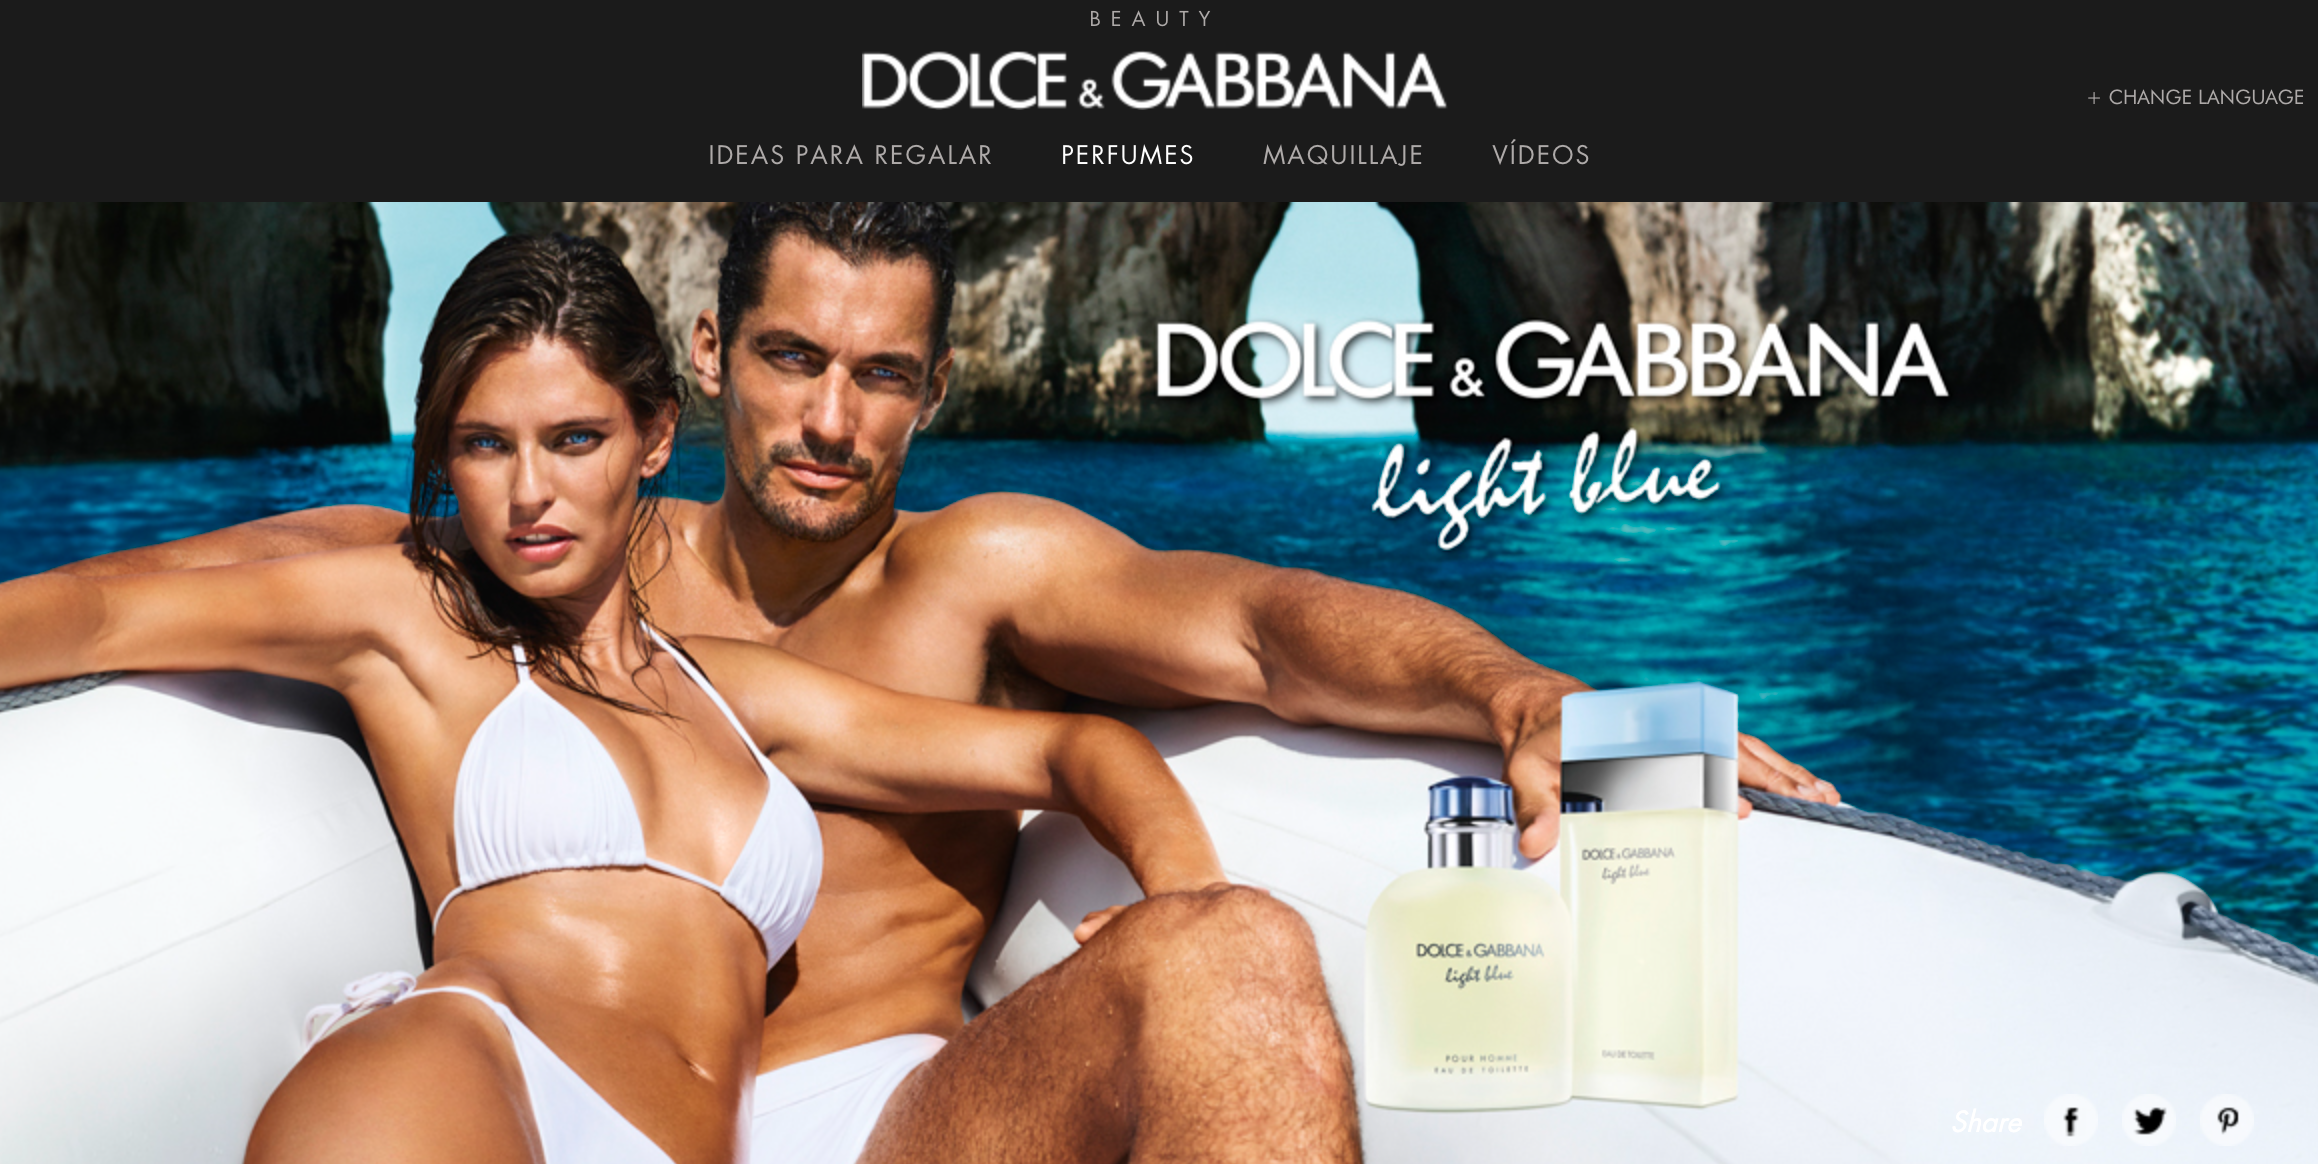 personalidad de marca crush Dolce&Gabbana